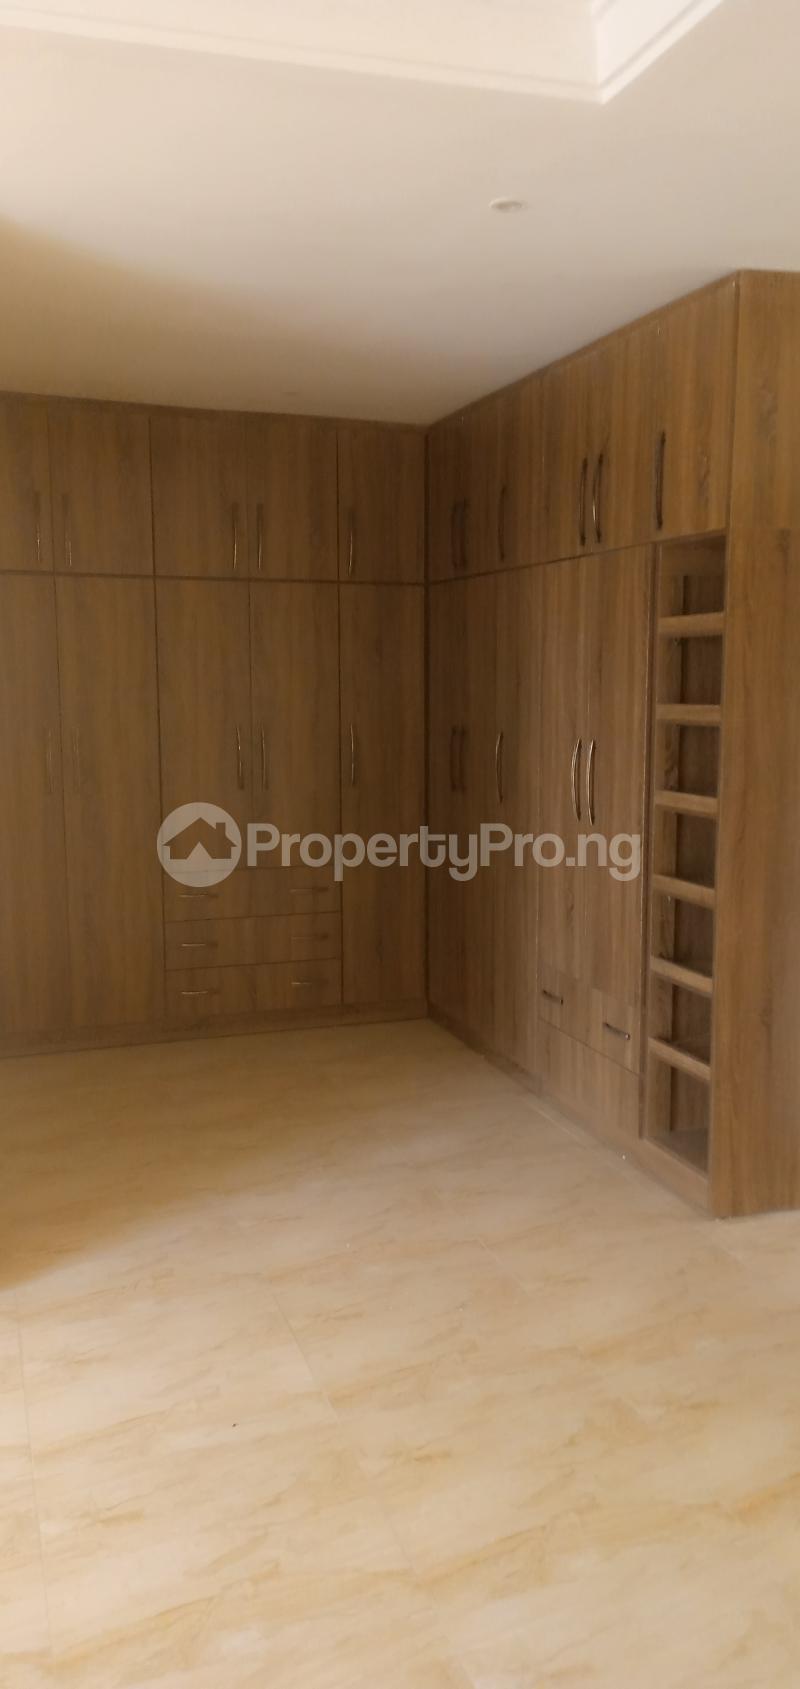 4 bedroom Terraced Duplex House for sale Close To Nnpc Guzape Guzape Abuja - 9